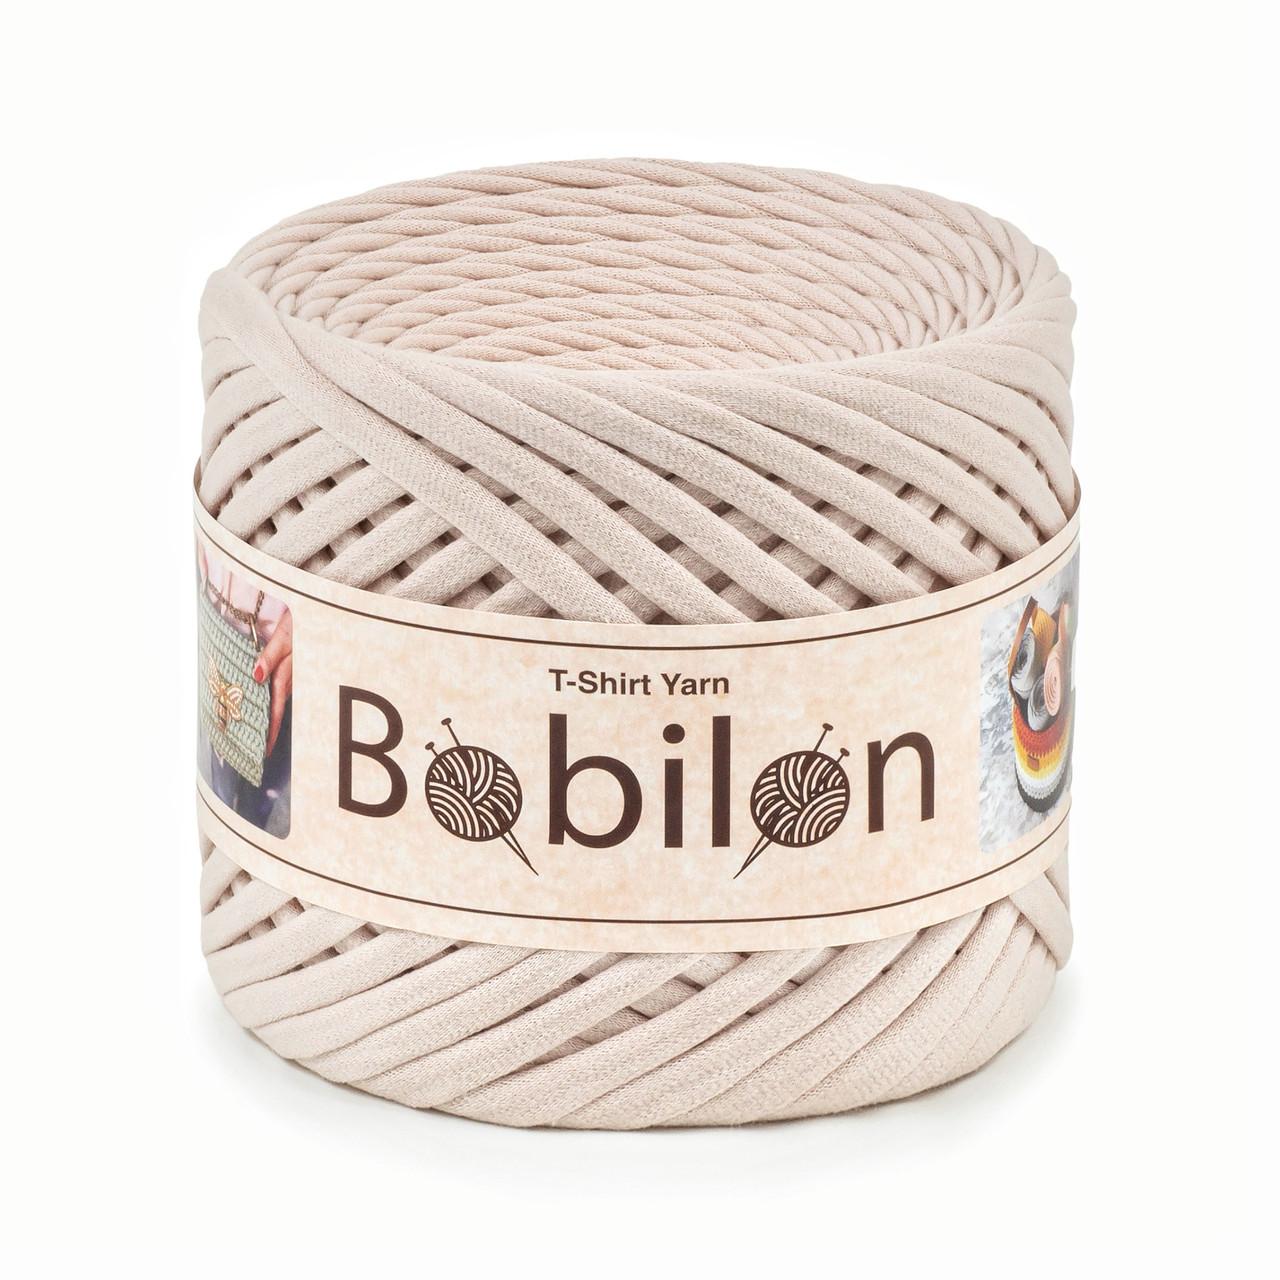 Трикотажная пряжа Bobilon Maxi (9-11 мм) Ivory Айвори